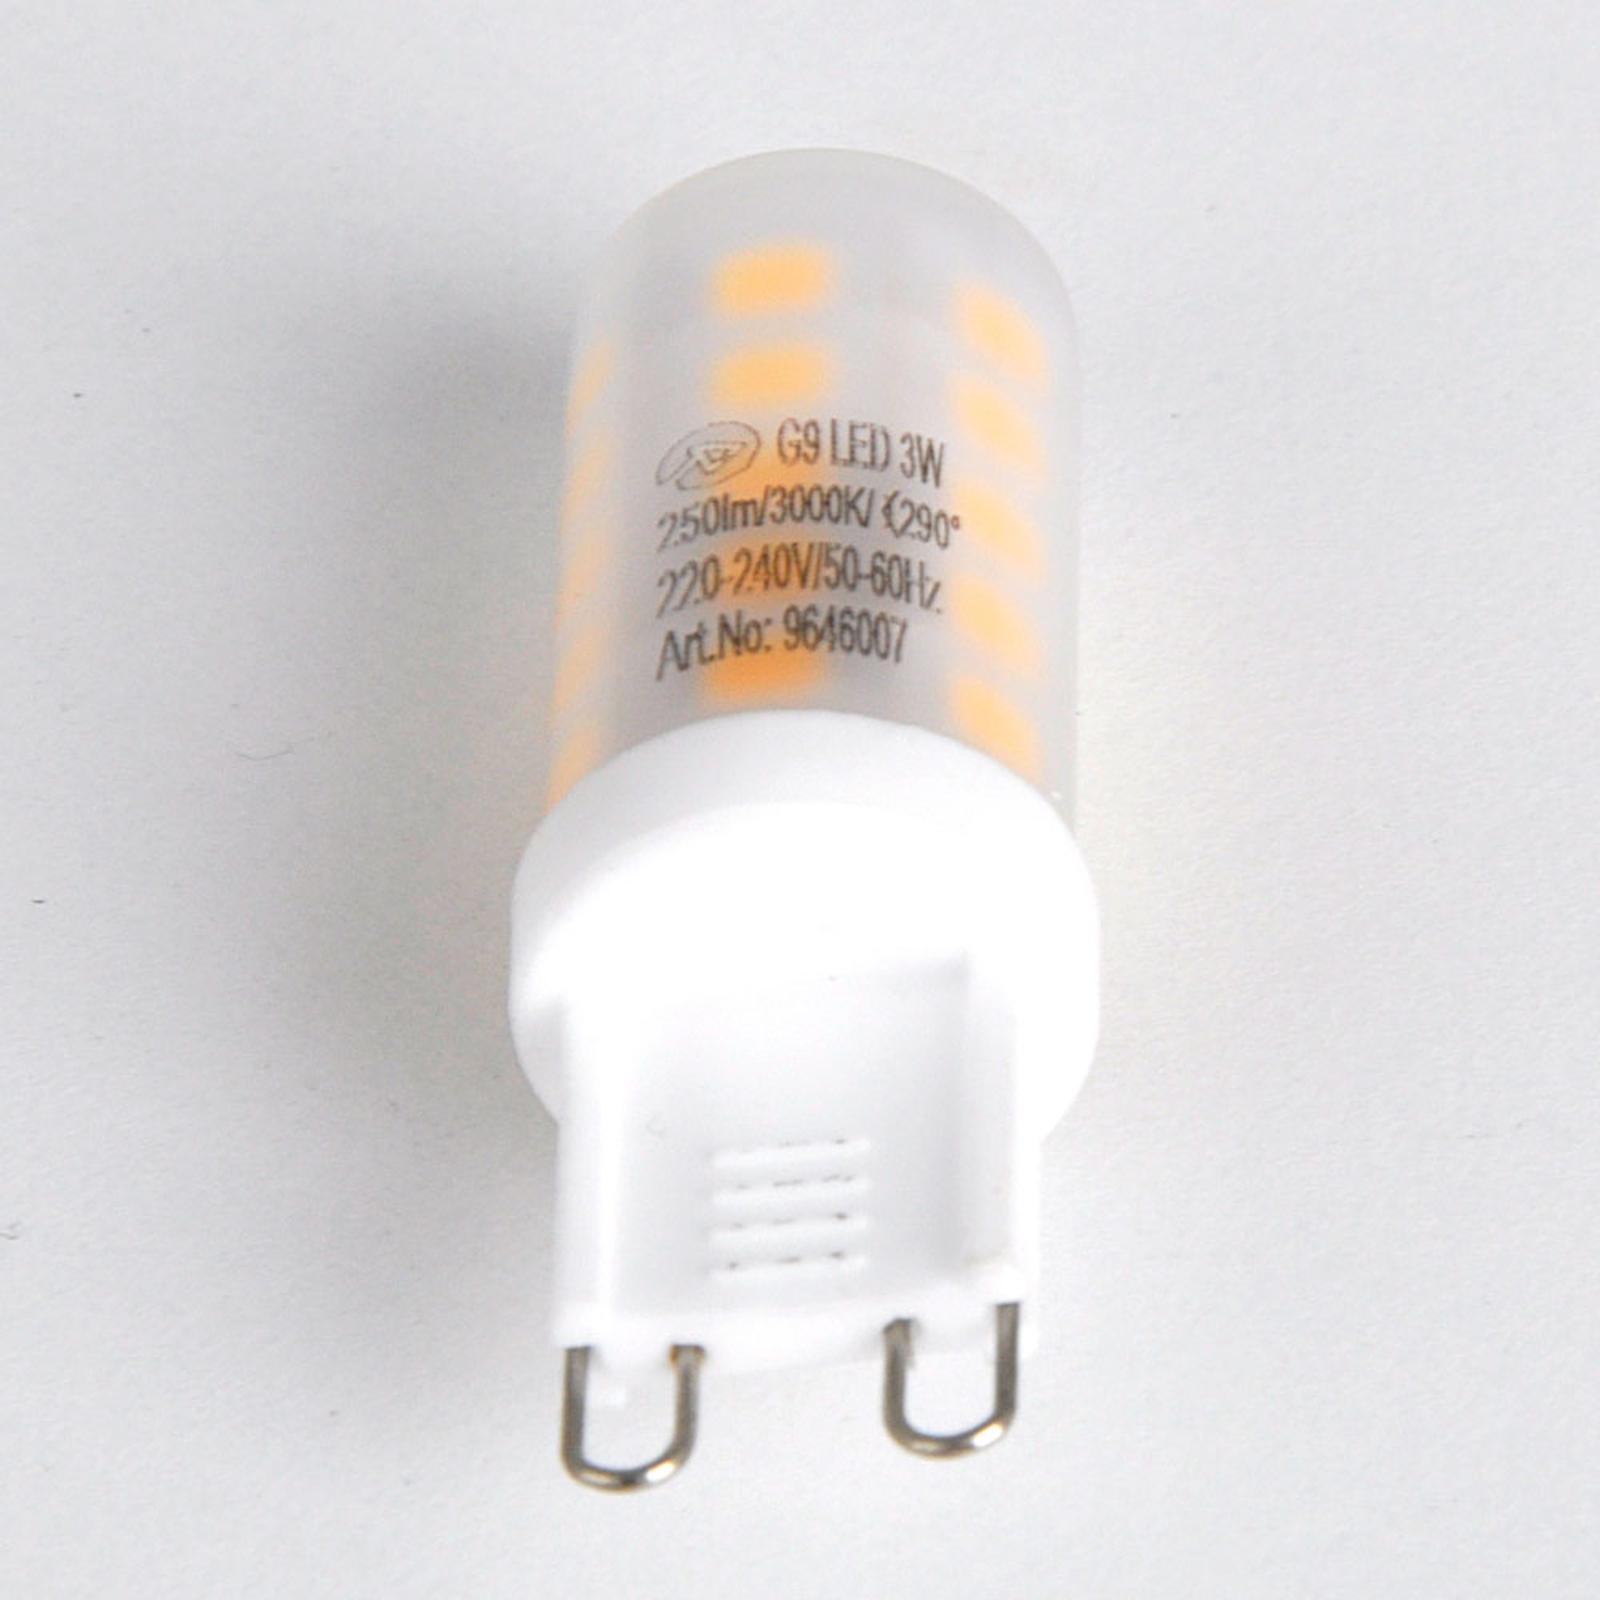 G9 3W 830 LED stiftlamp dimbaar